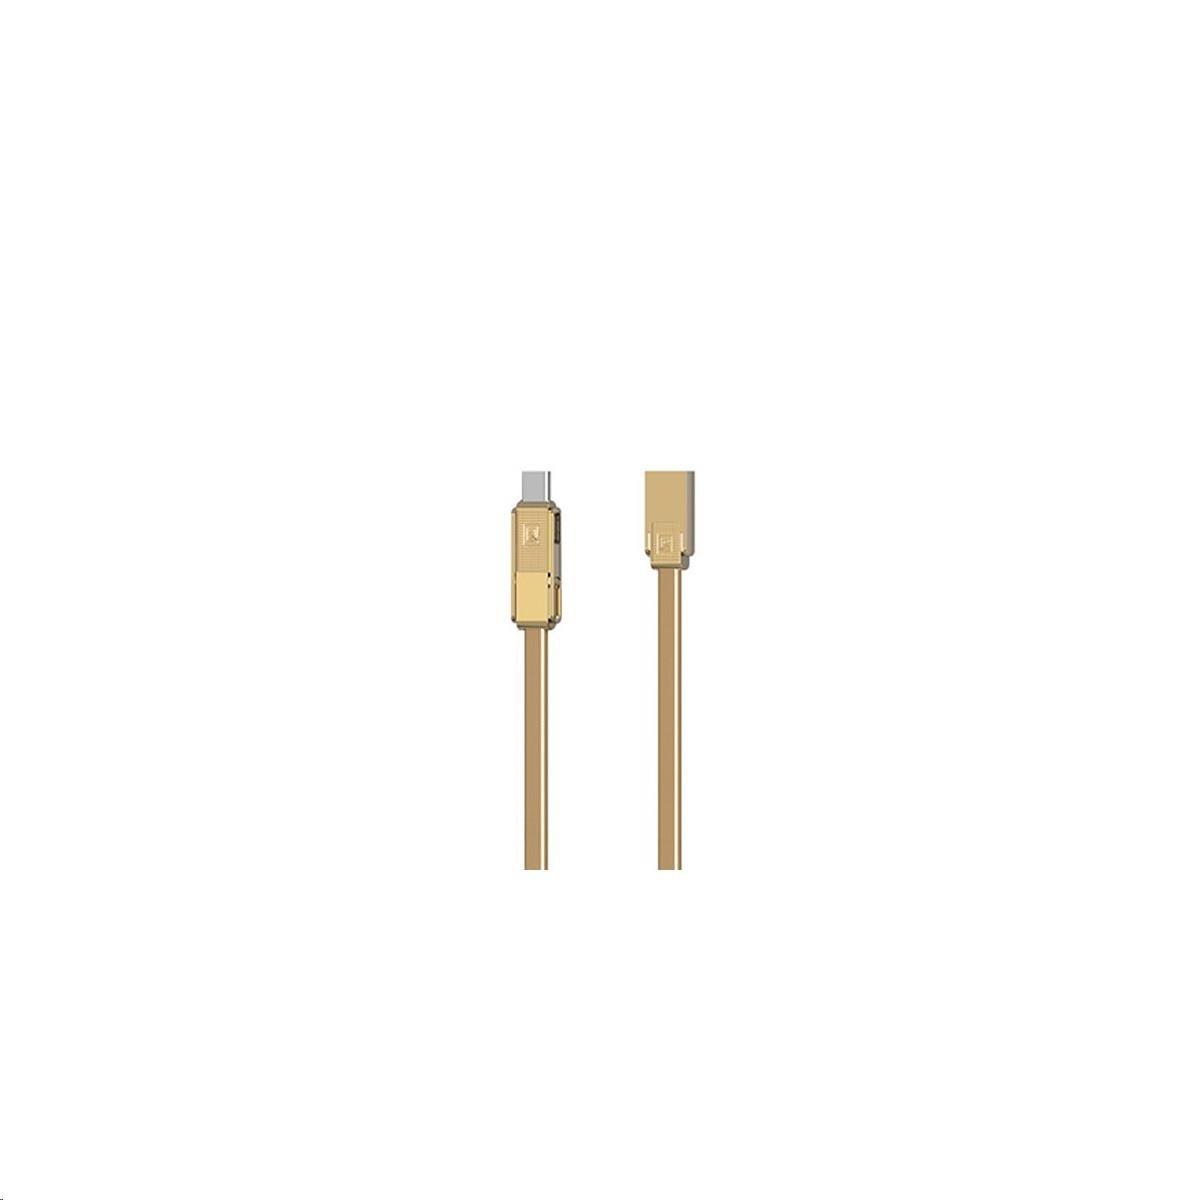 Remax RC-070th , univerzální datový kabel 3v1, USB-C/  Micro USB / lighting , 1m, 2,1A, GOLD